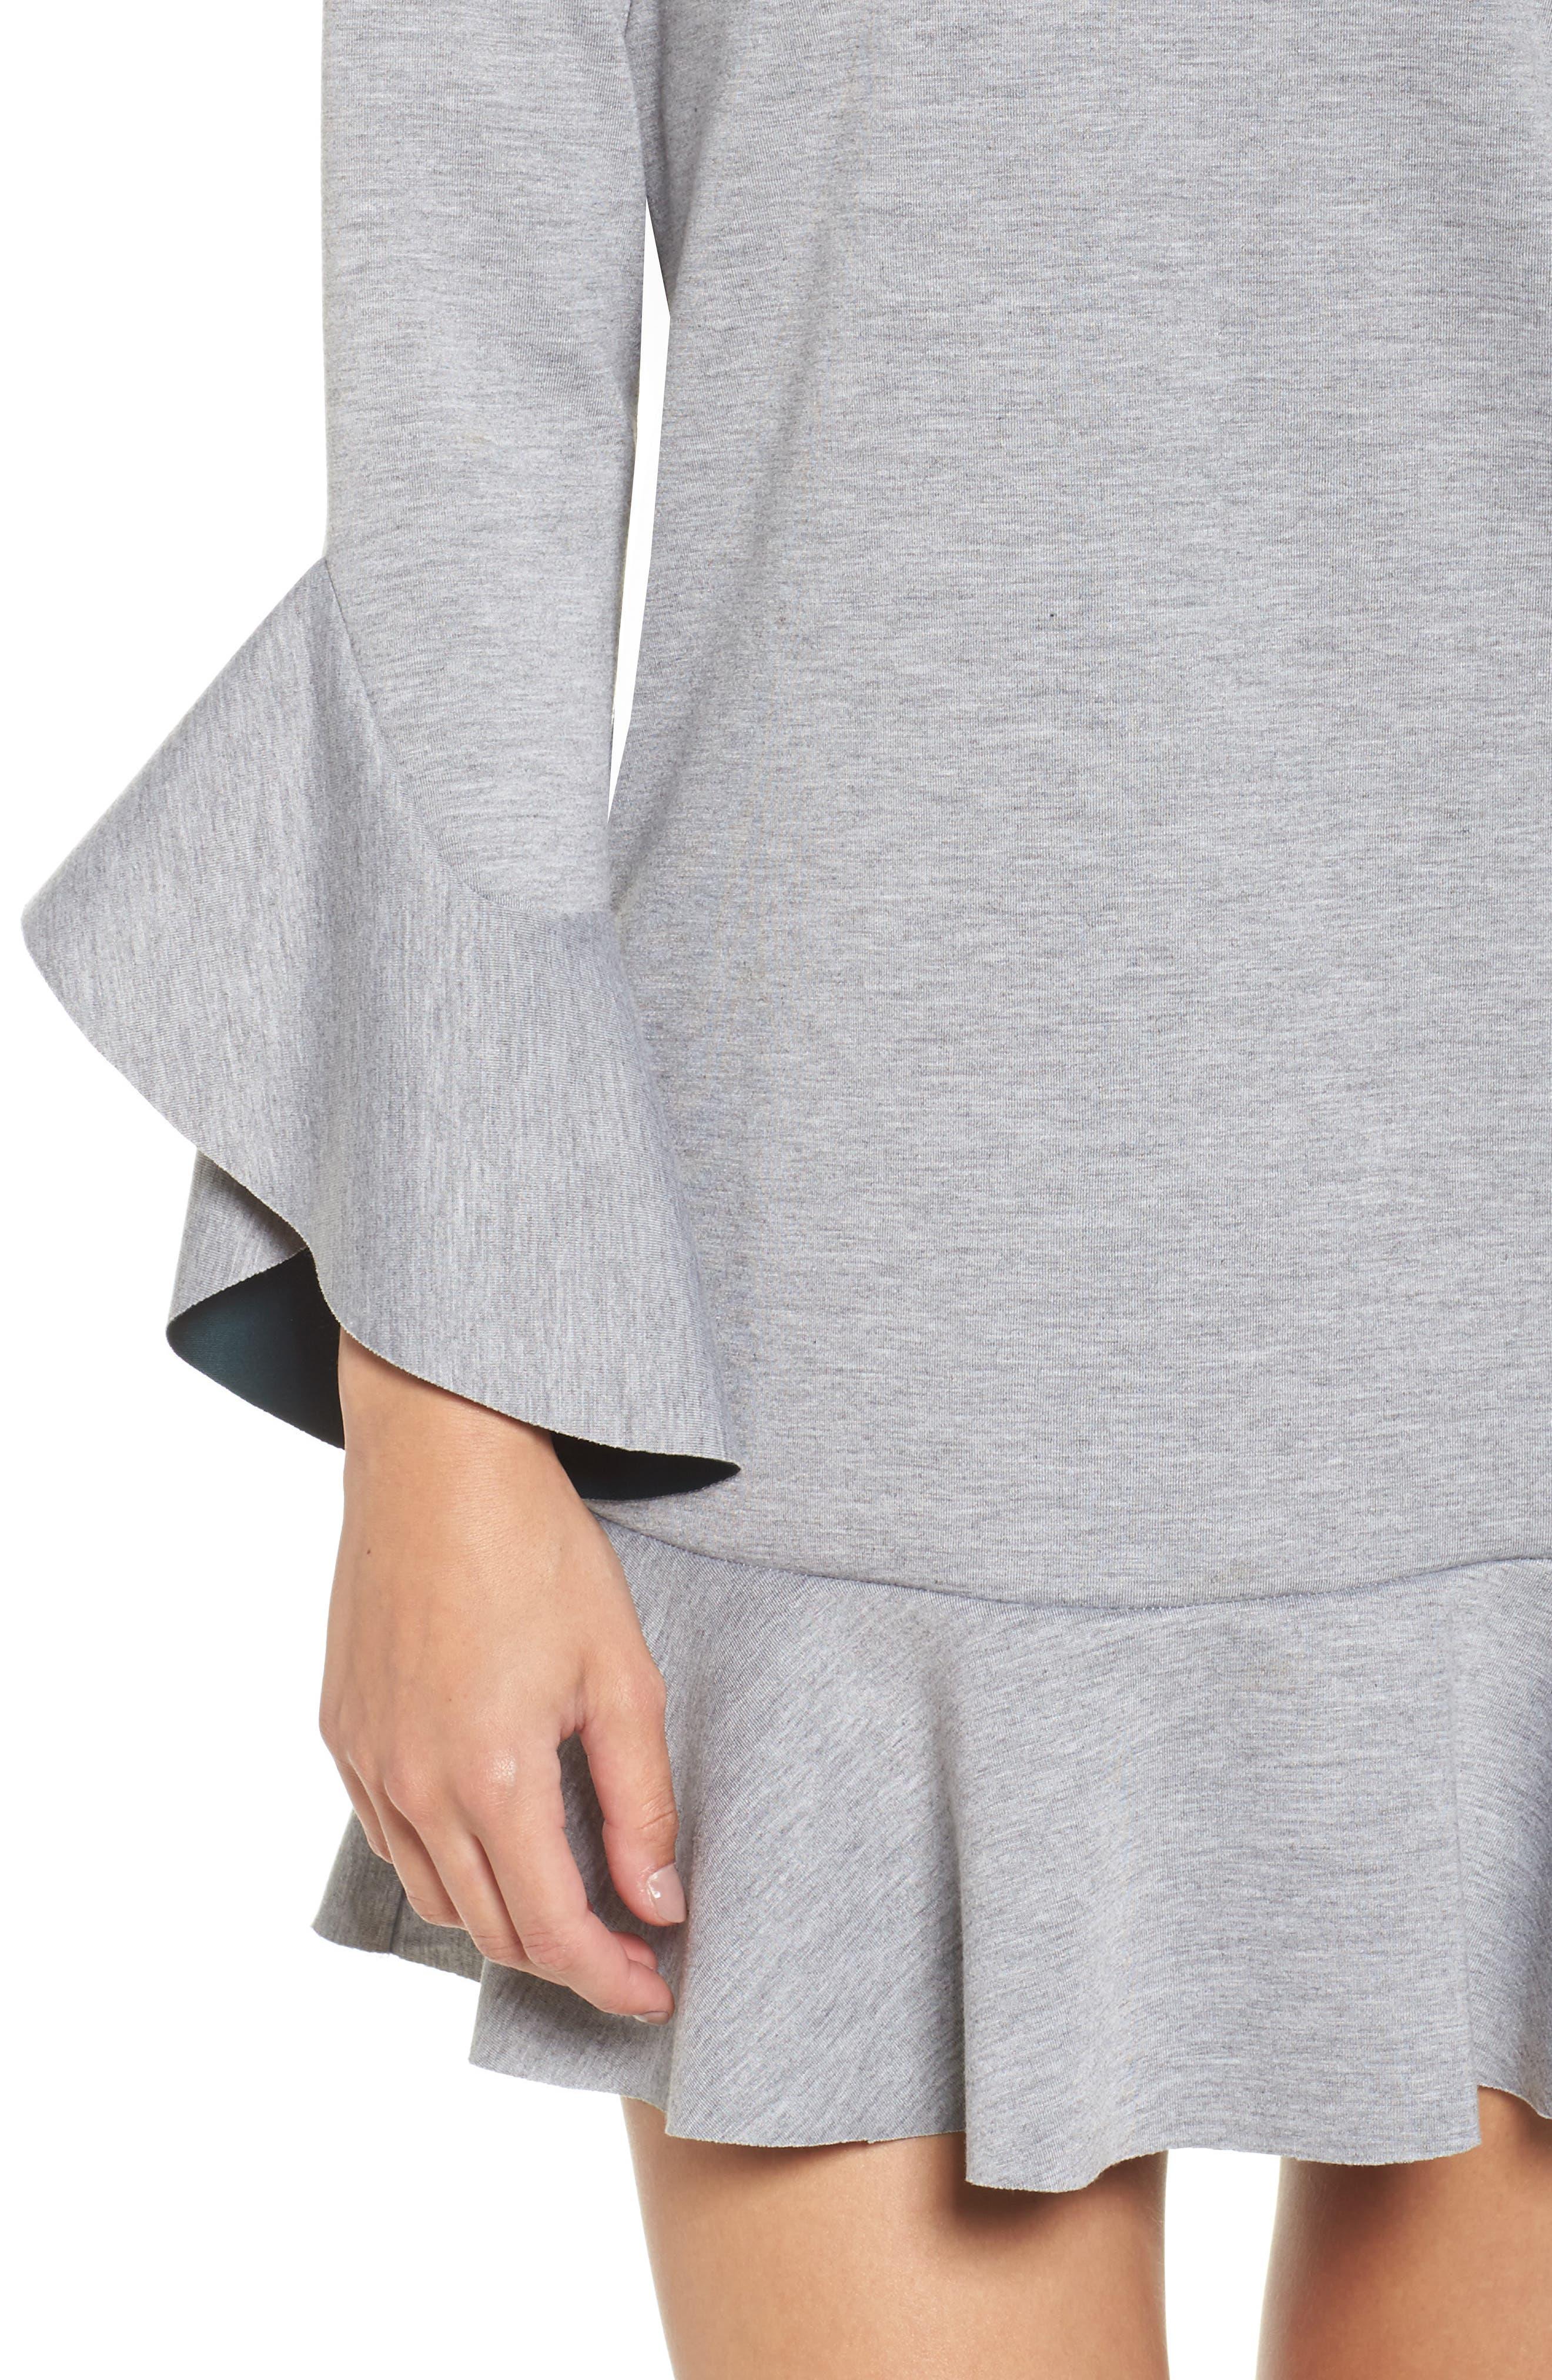 Ruffle Scuba Dress,                             Alternate thumbnail 5, color,                             Grey Heather